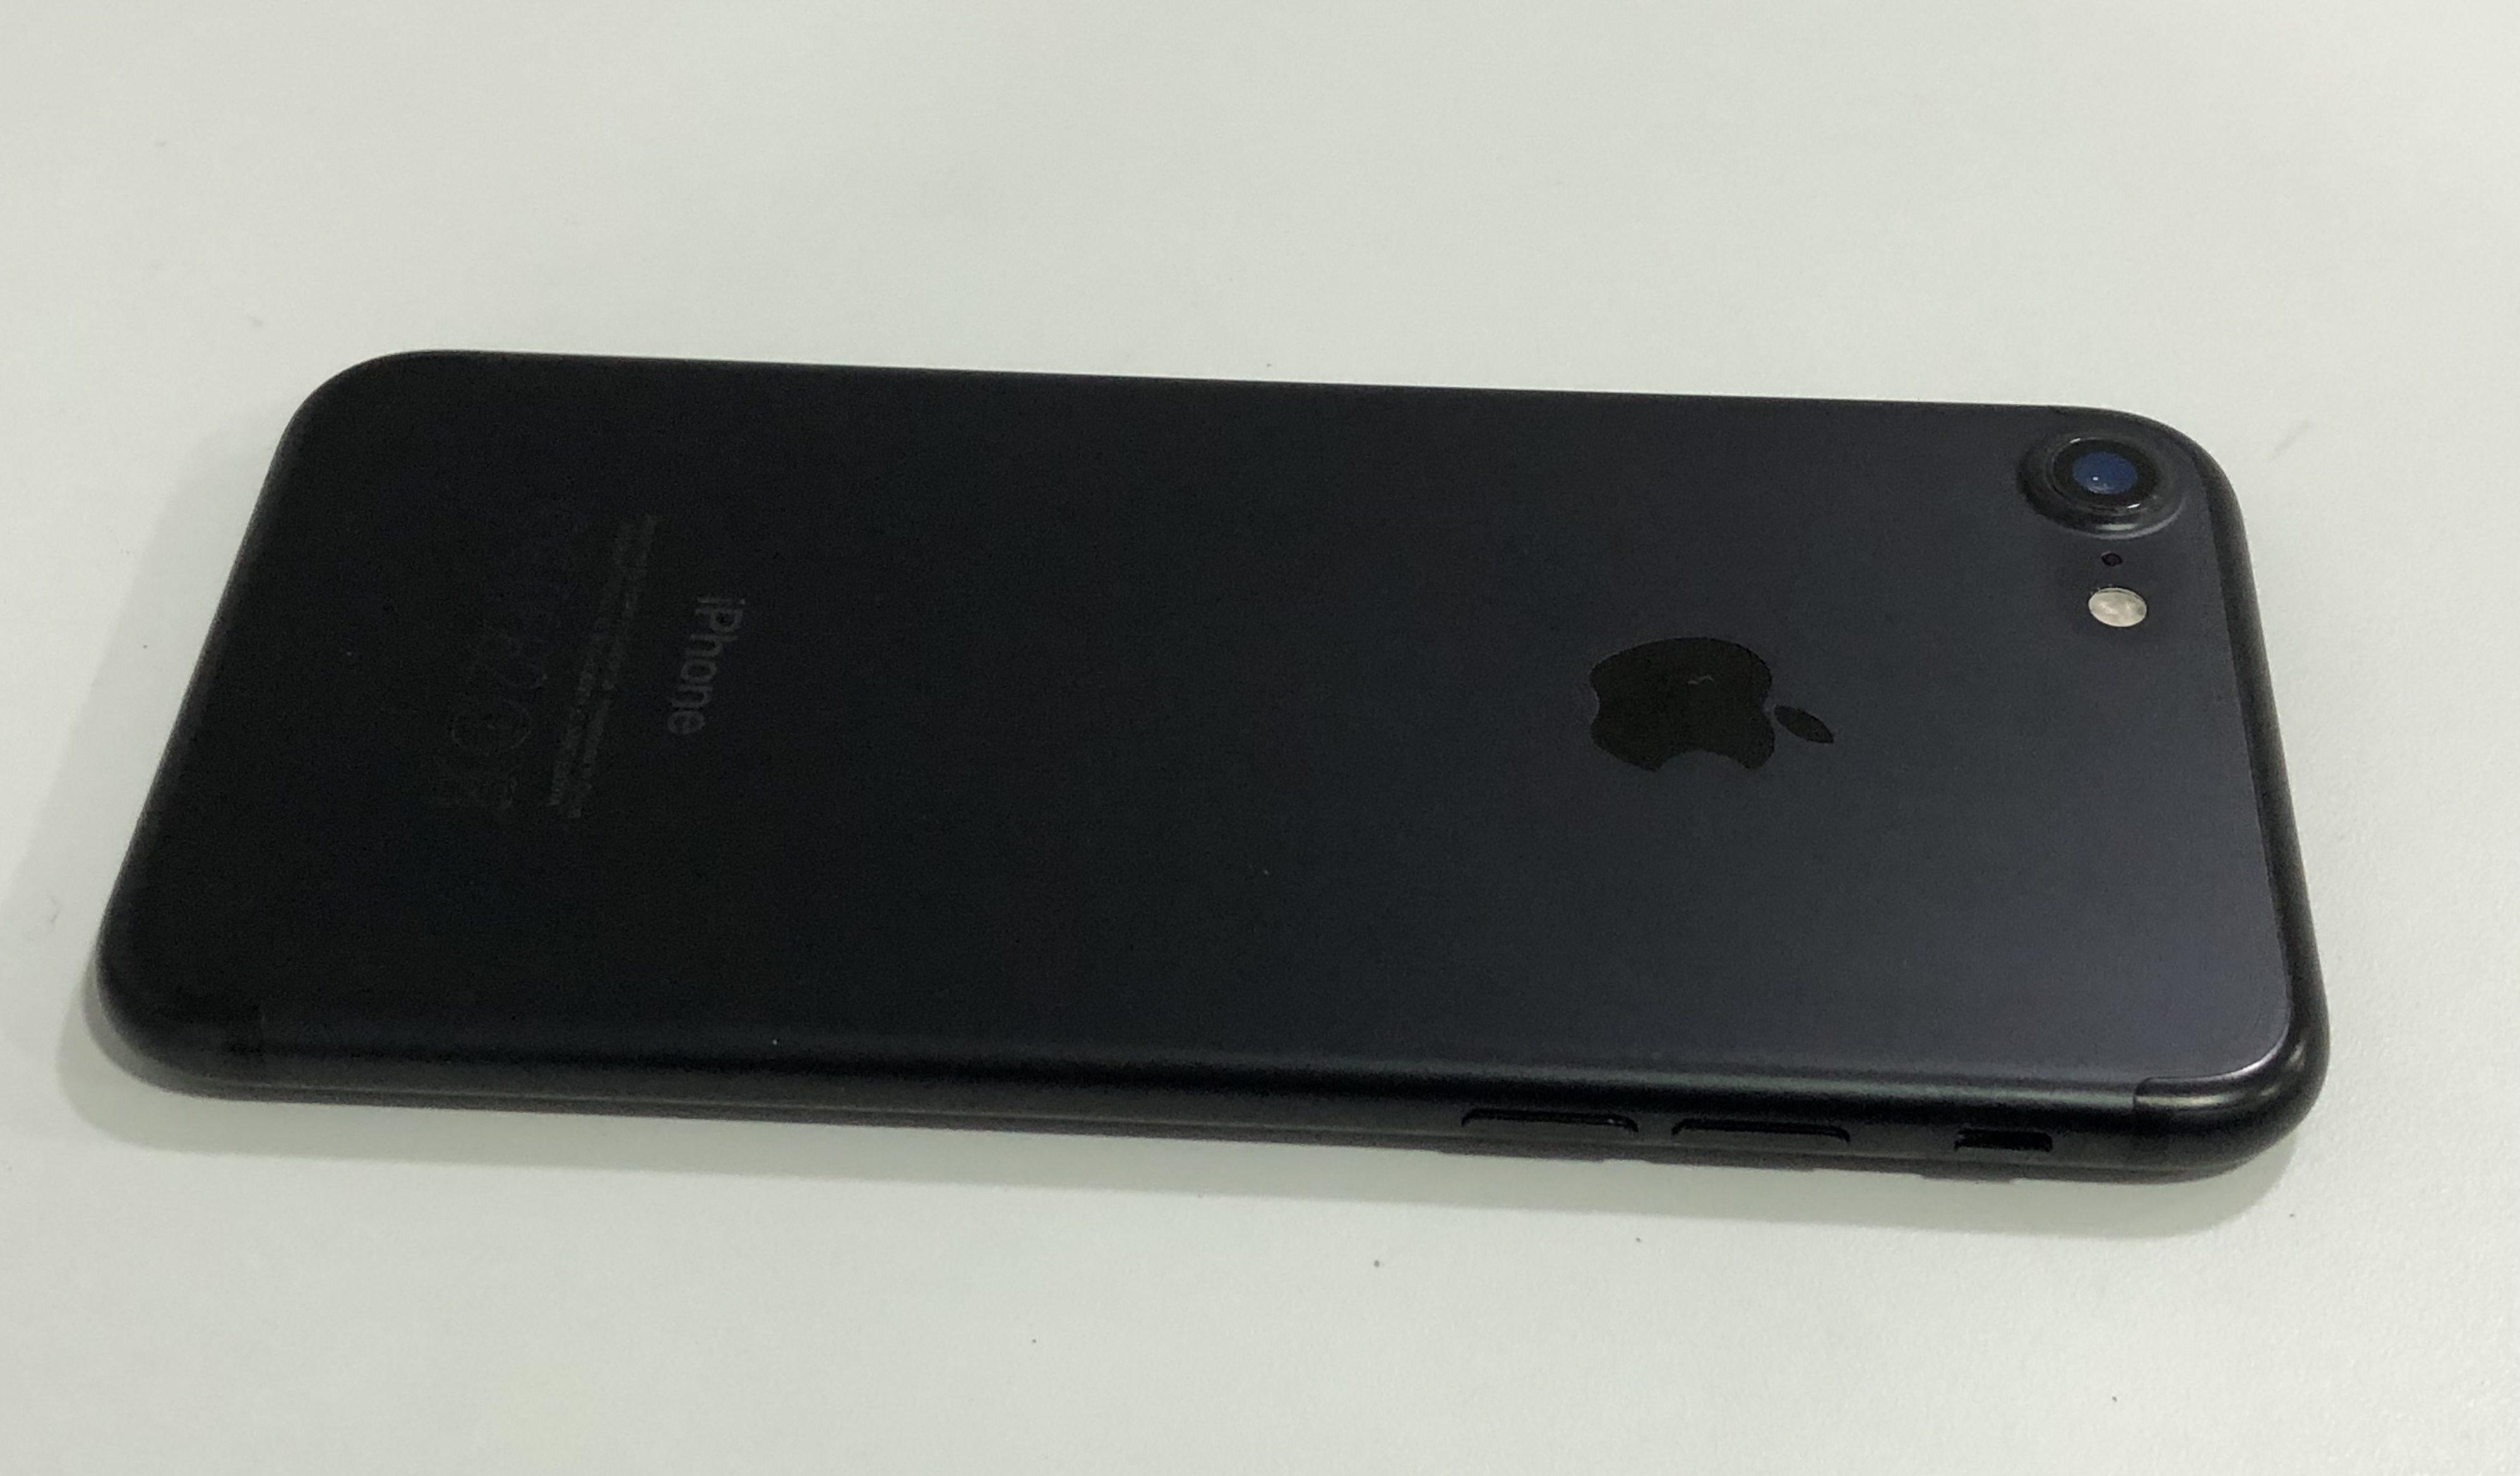 iPhone 7 32GB, 32 GB, BLACK, Afbeelding 2